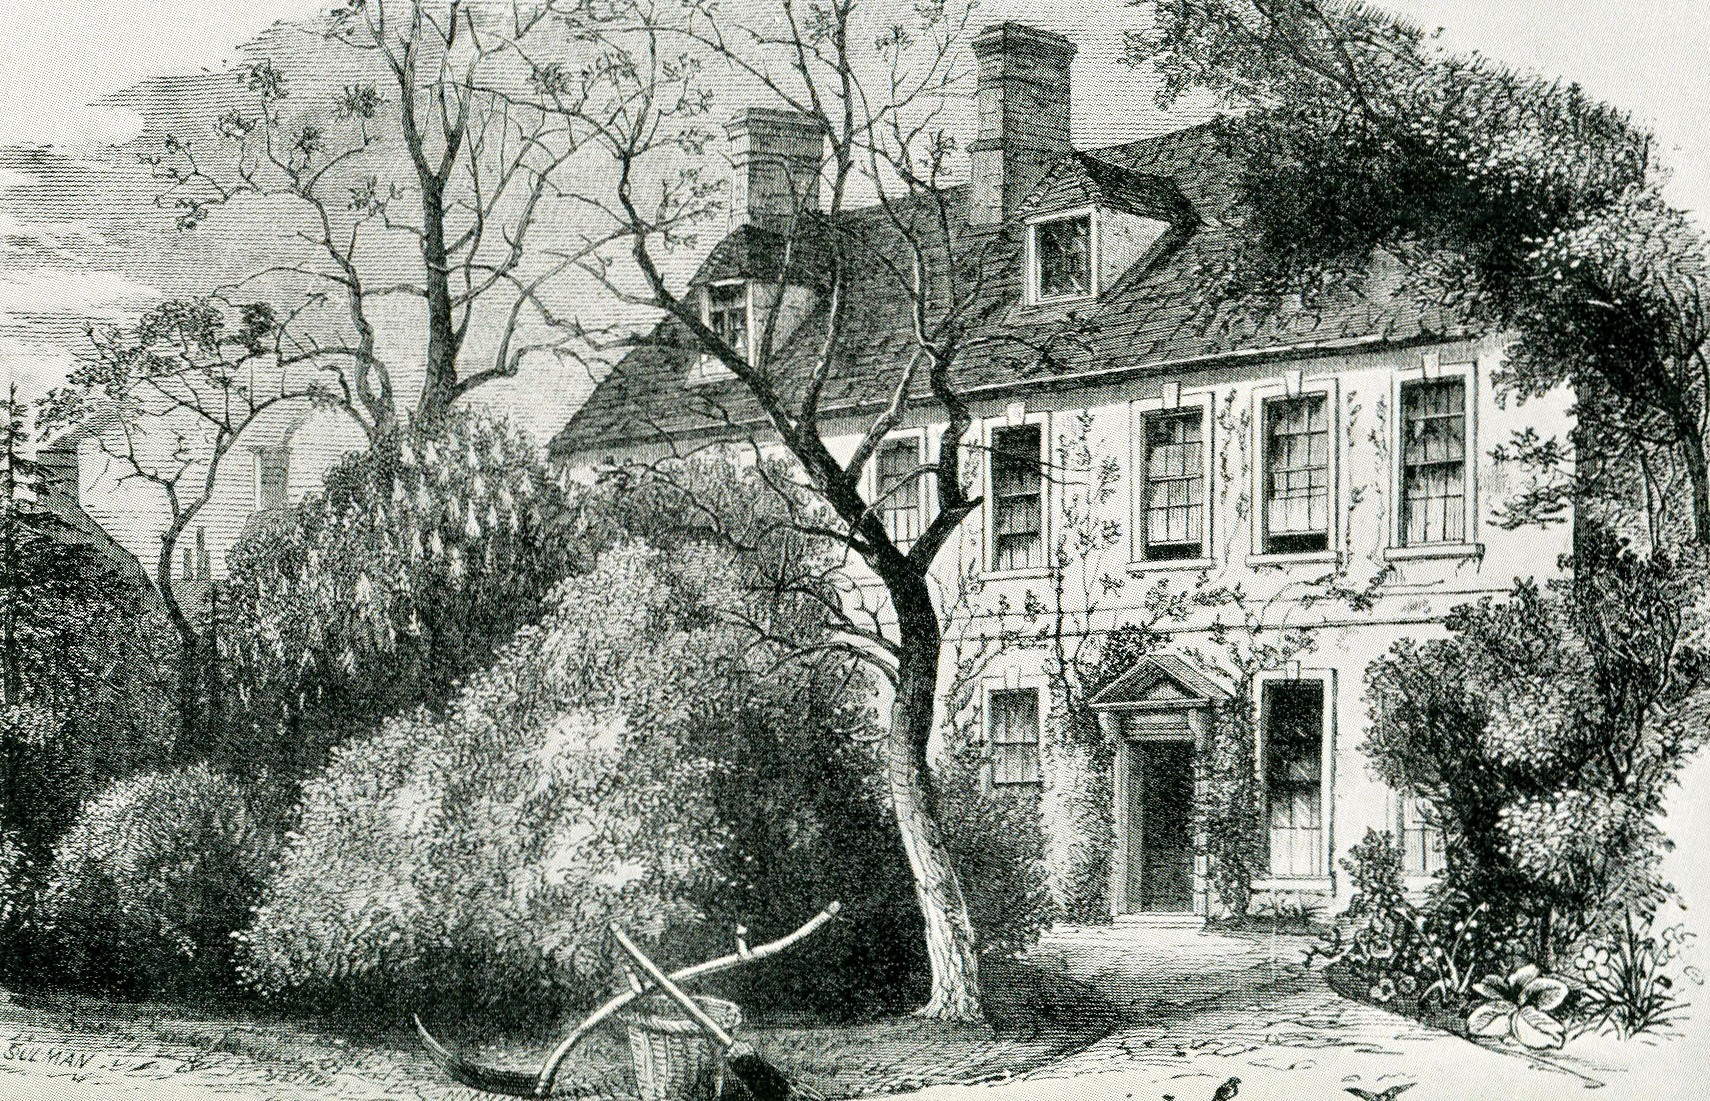 Olney vicarage. Thomas Sulman. 1879